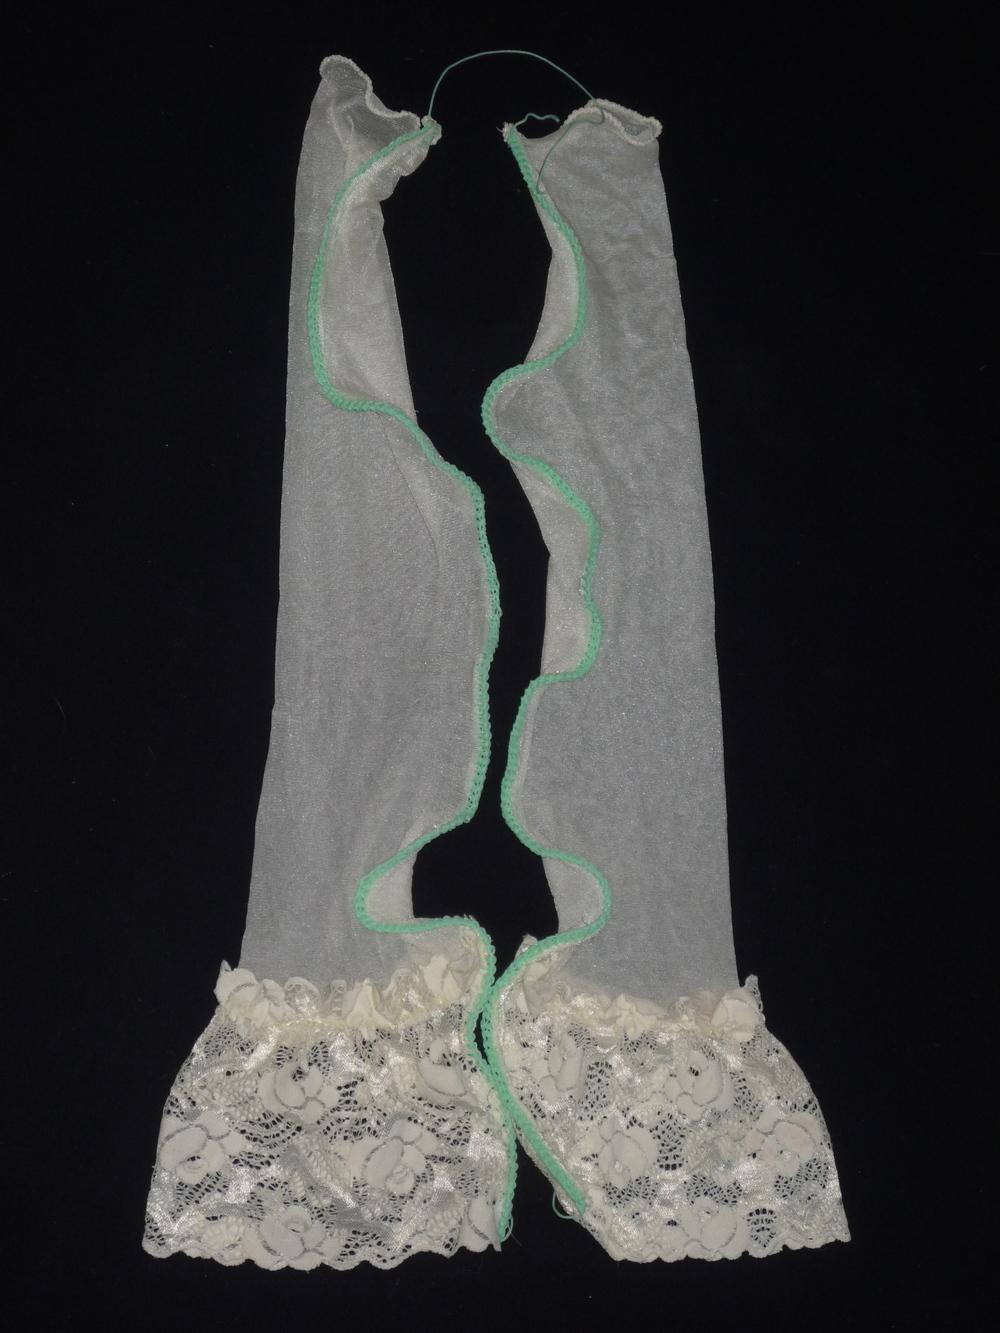 Hoffnung , Nylons, Maurerschnur, gestrickt, 120x43x3 cm